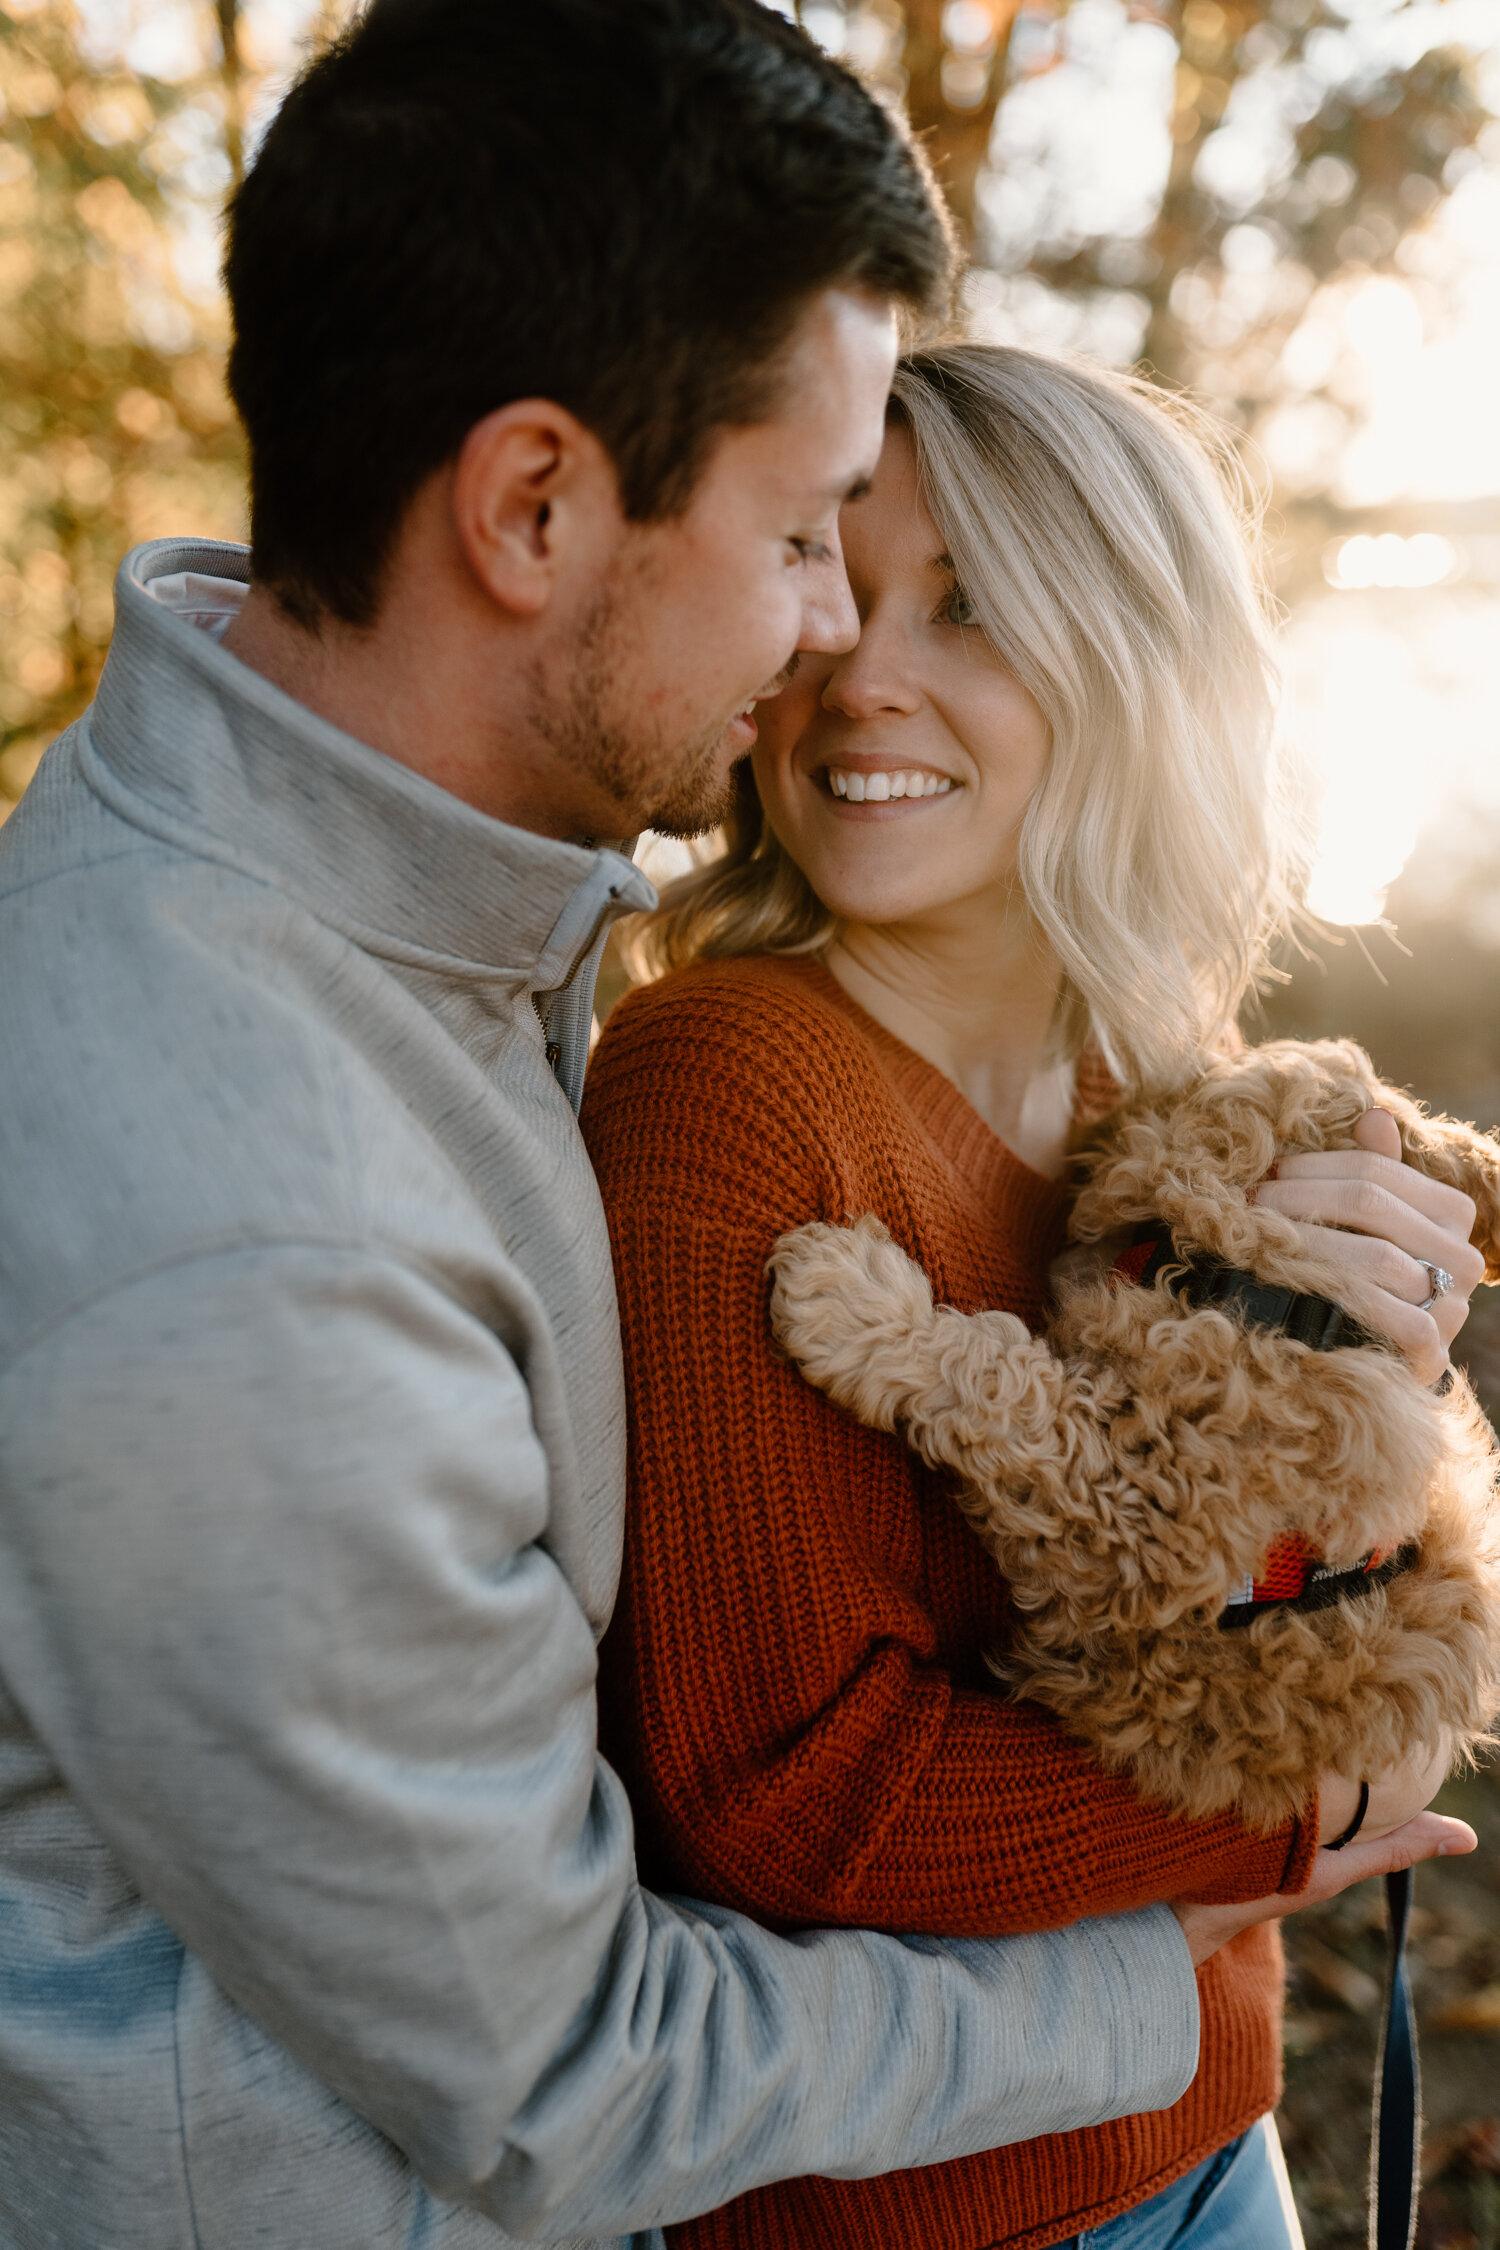 Lake Brandt Greensboro, NC Fall Engagement Session | Intimate Wedding & Elopement Photographer